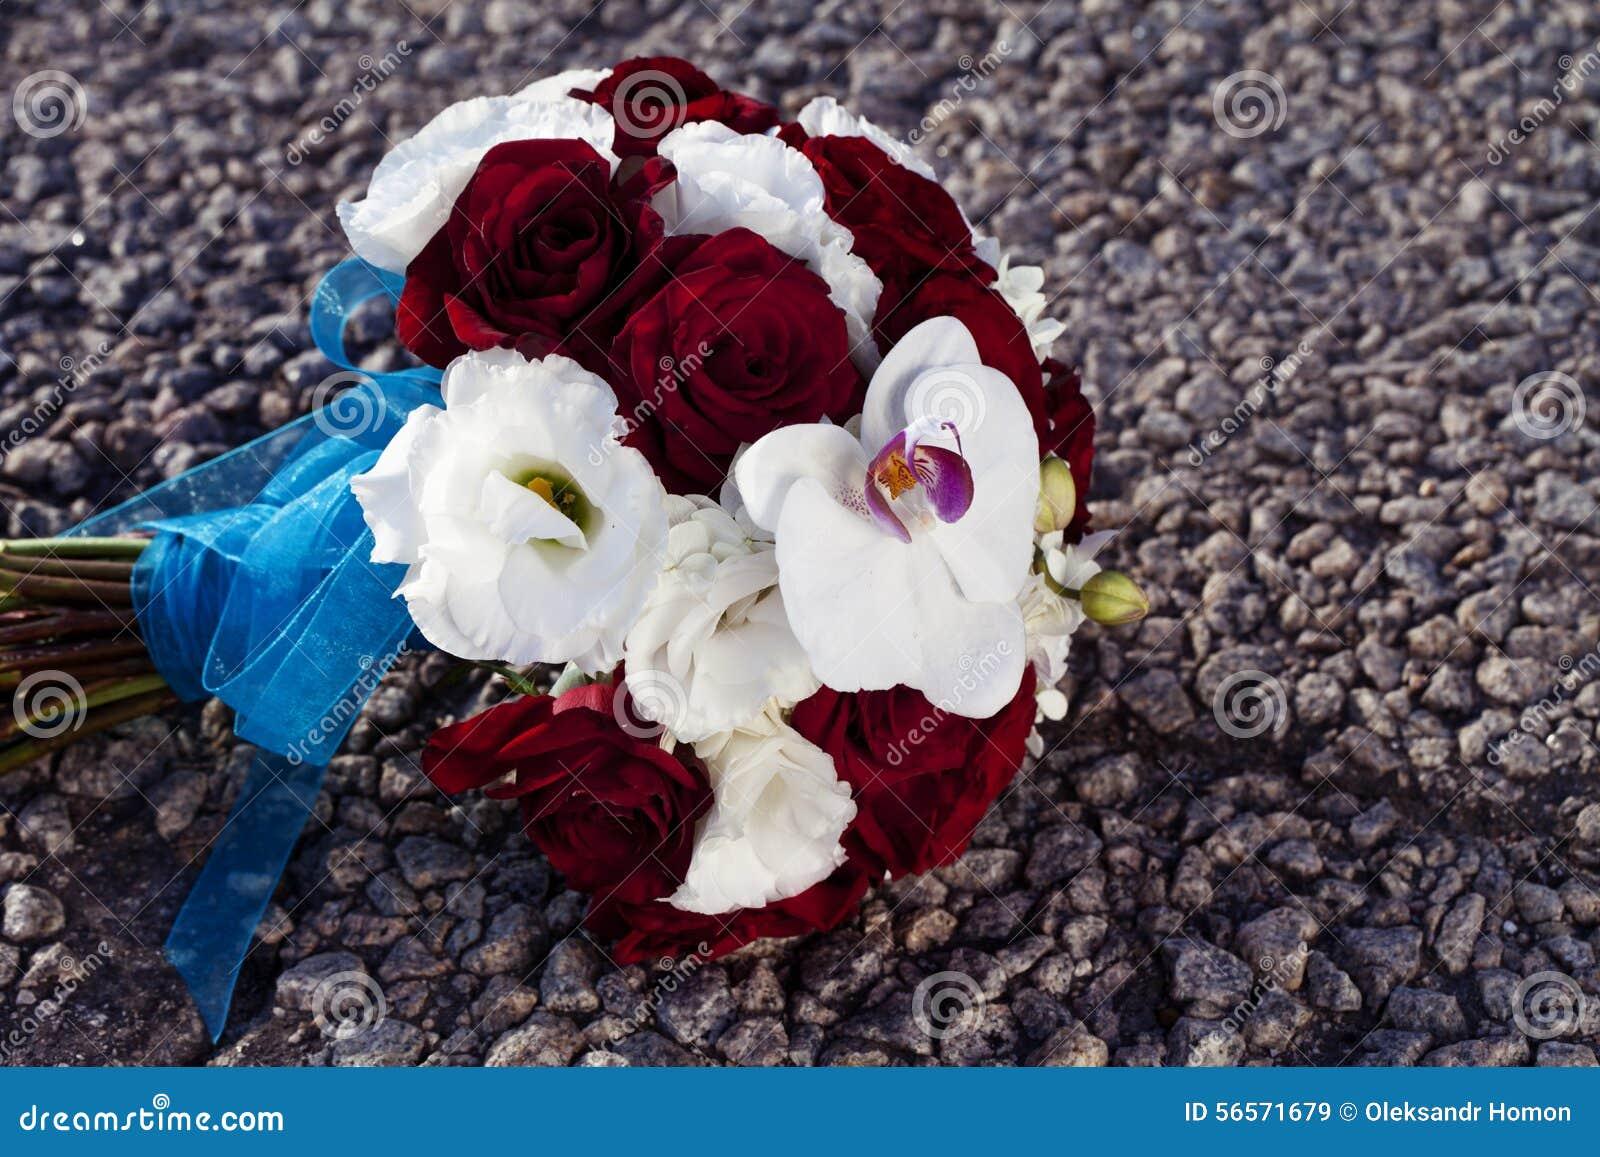 Download γάμος πρώτου πλάνου εστίασης 3 ανθοδεσμών Στοκ Εικόνα - εικόνα από bazaars, φρέσκος: 56571679